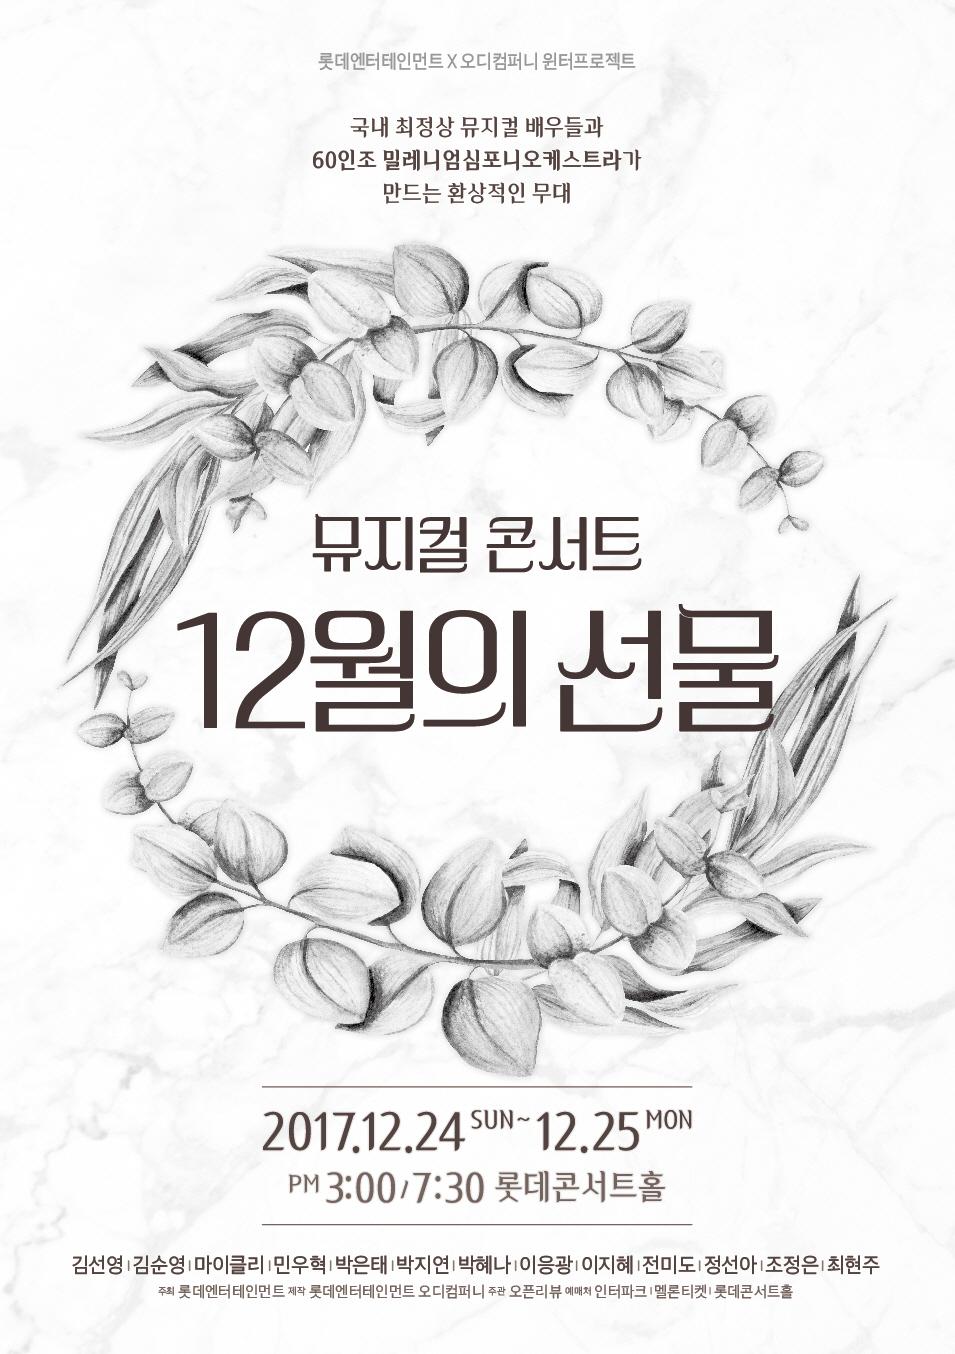 http://plent.co.kr/artists/kim-sun-young/wp-content/uploads/2015/07/뮤지컬-12월의-선물.jpg